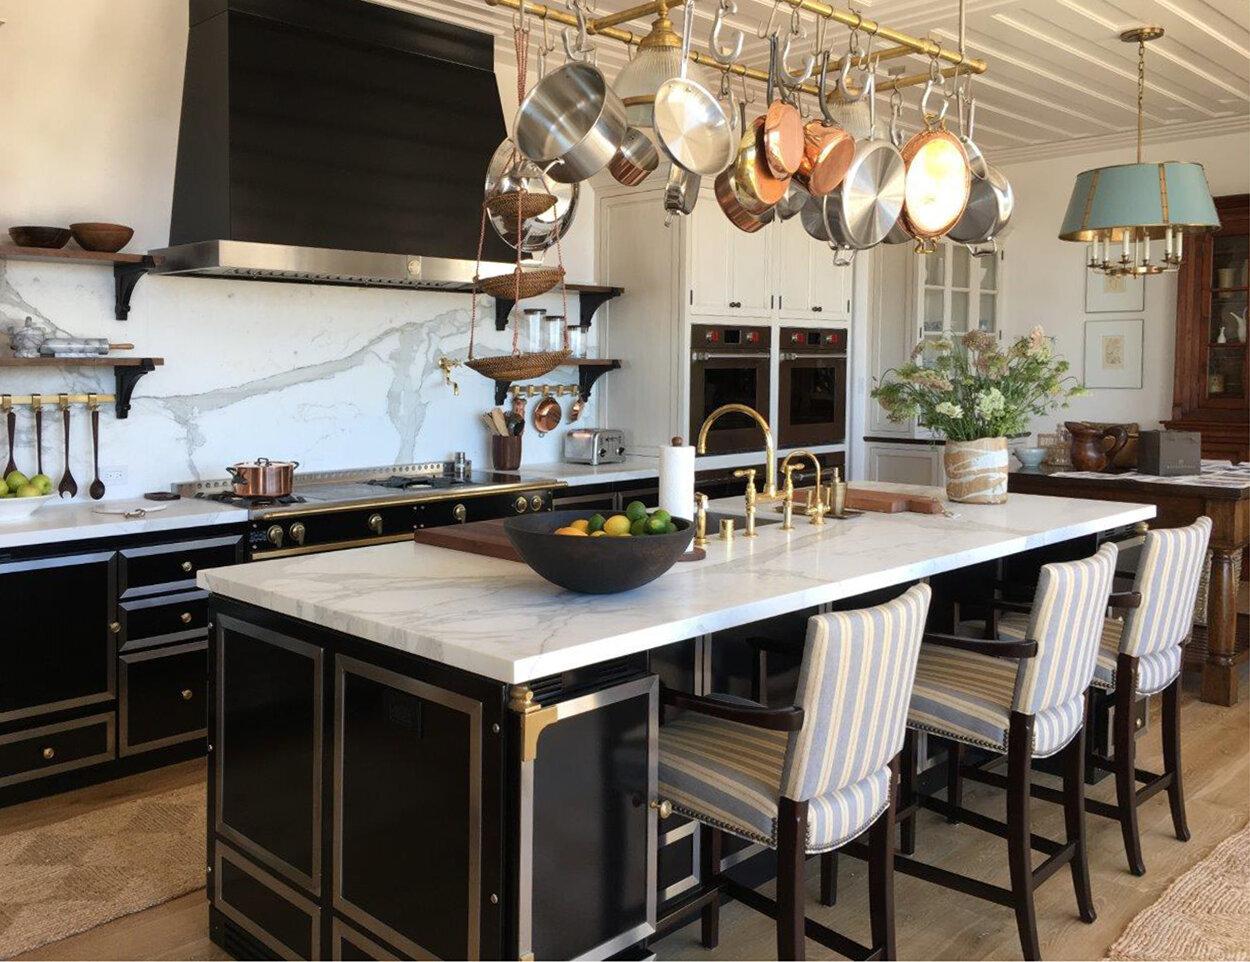 Full customized La Cornue solution including cabinetry